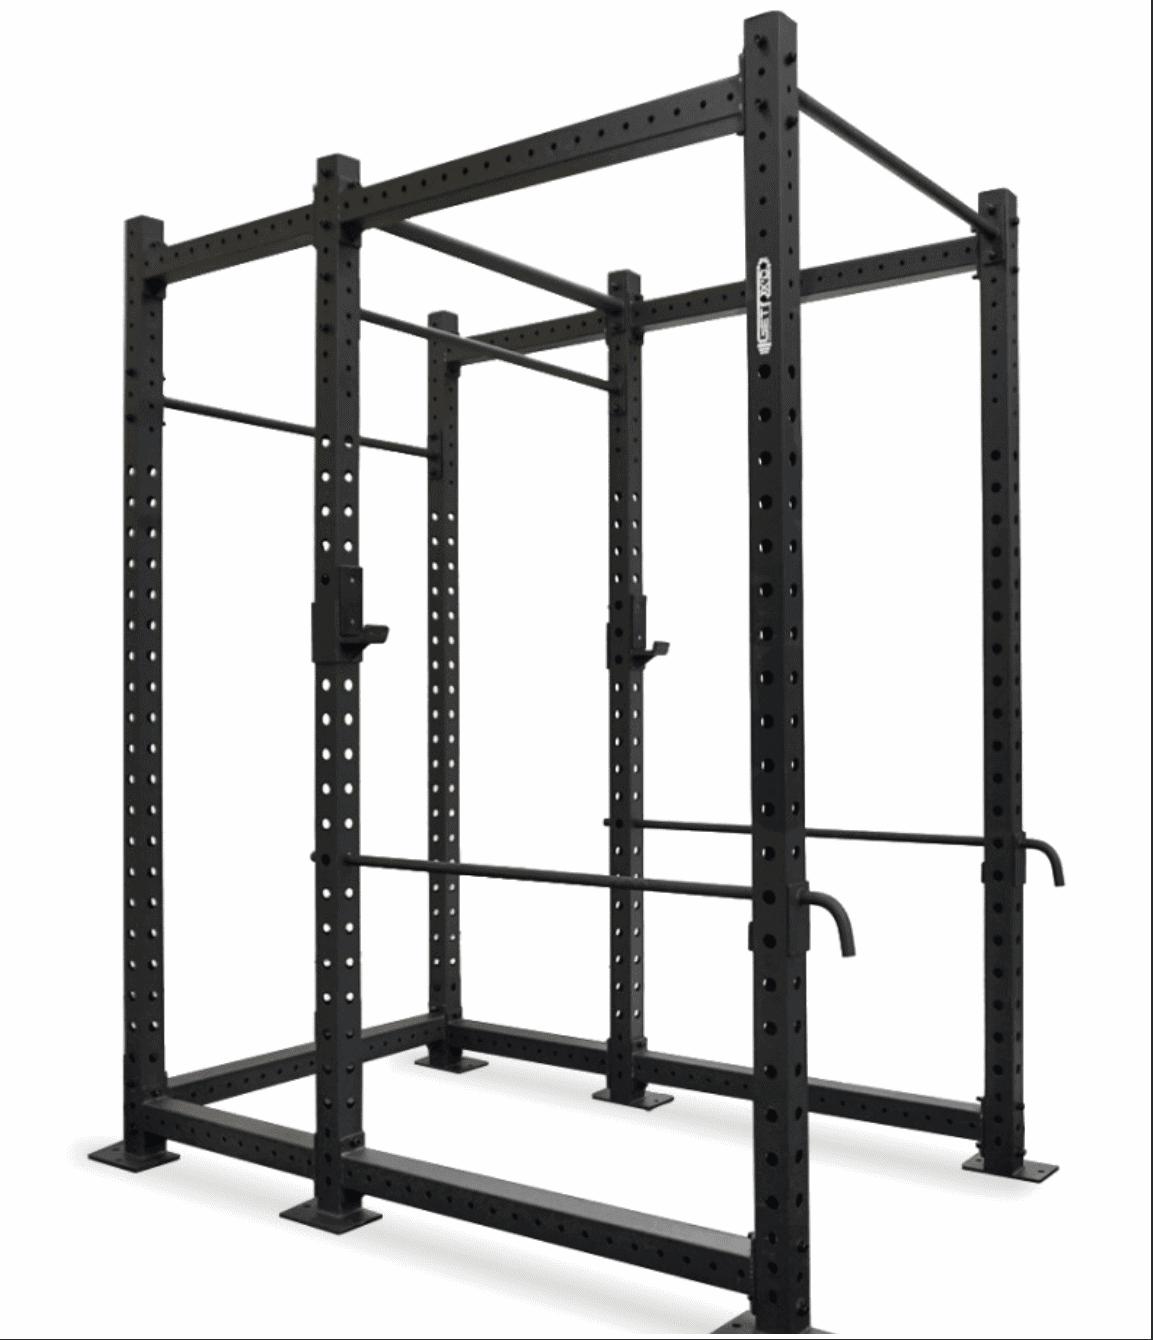 6-Post Titan Power Rack